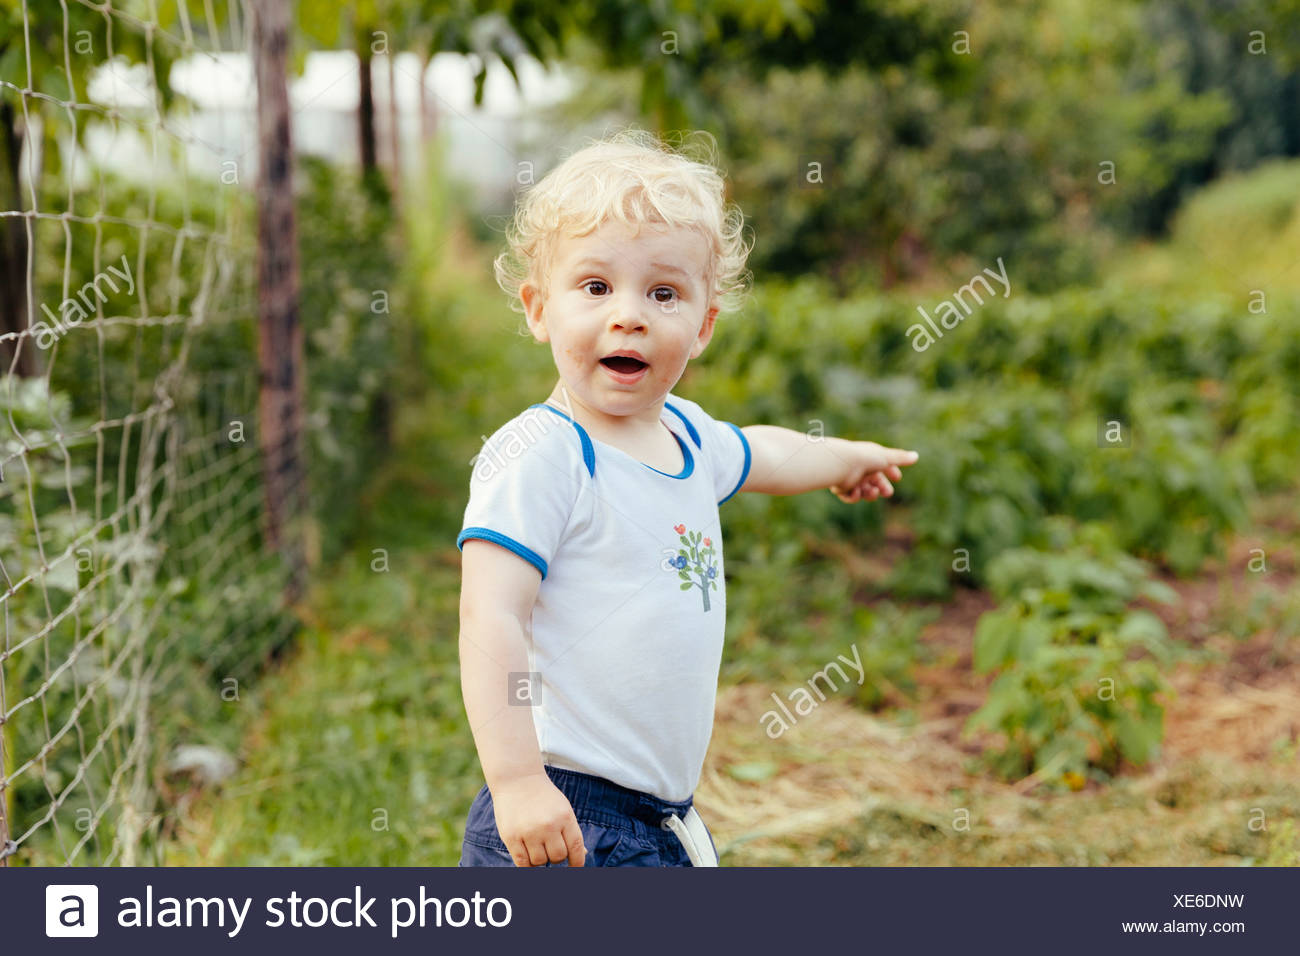 Toddler pointing at something in vegetable garden - Stock Image